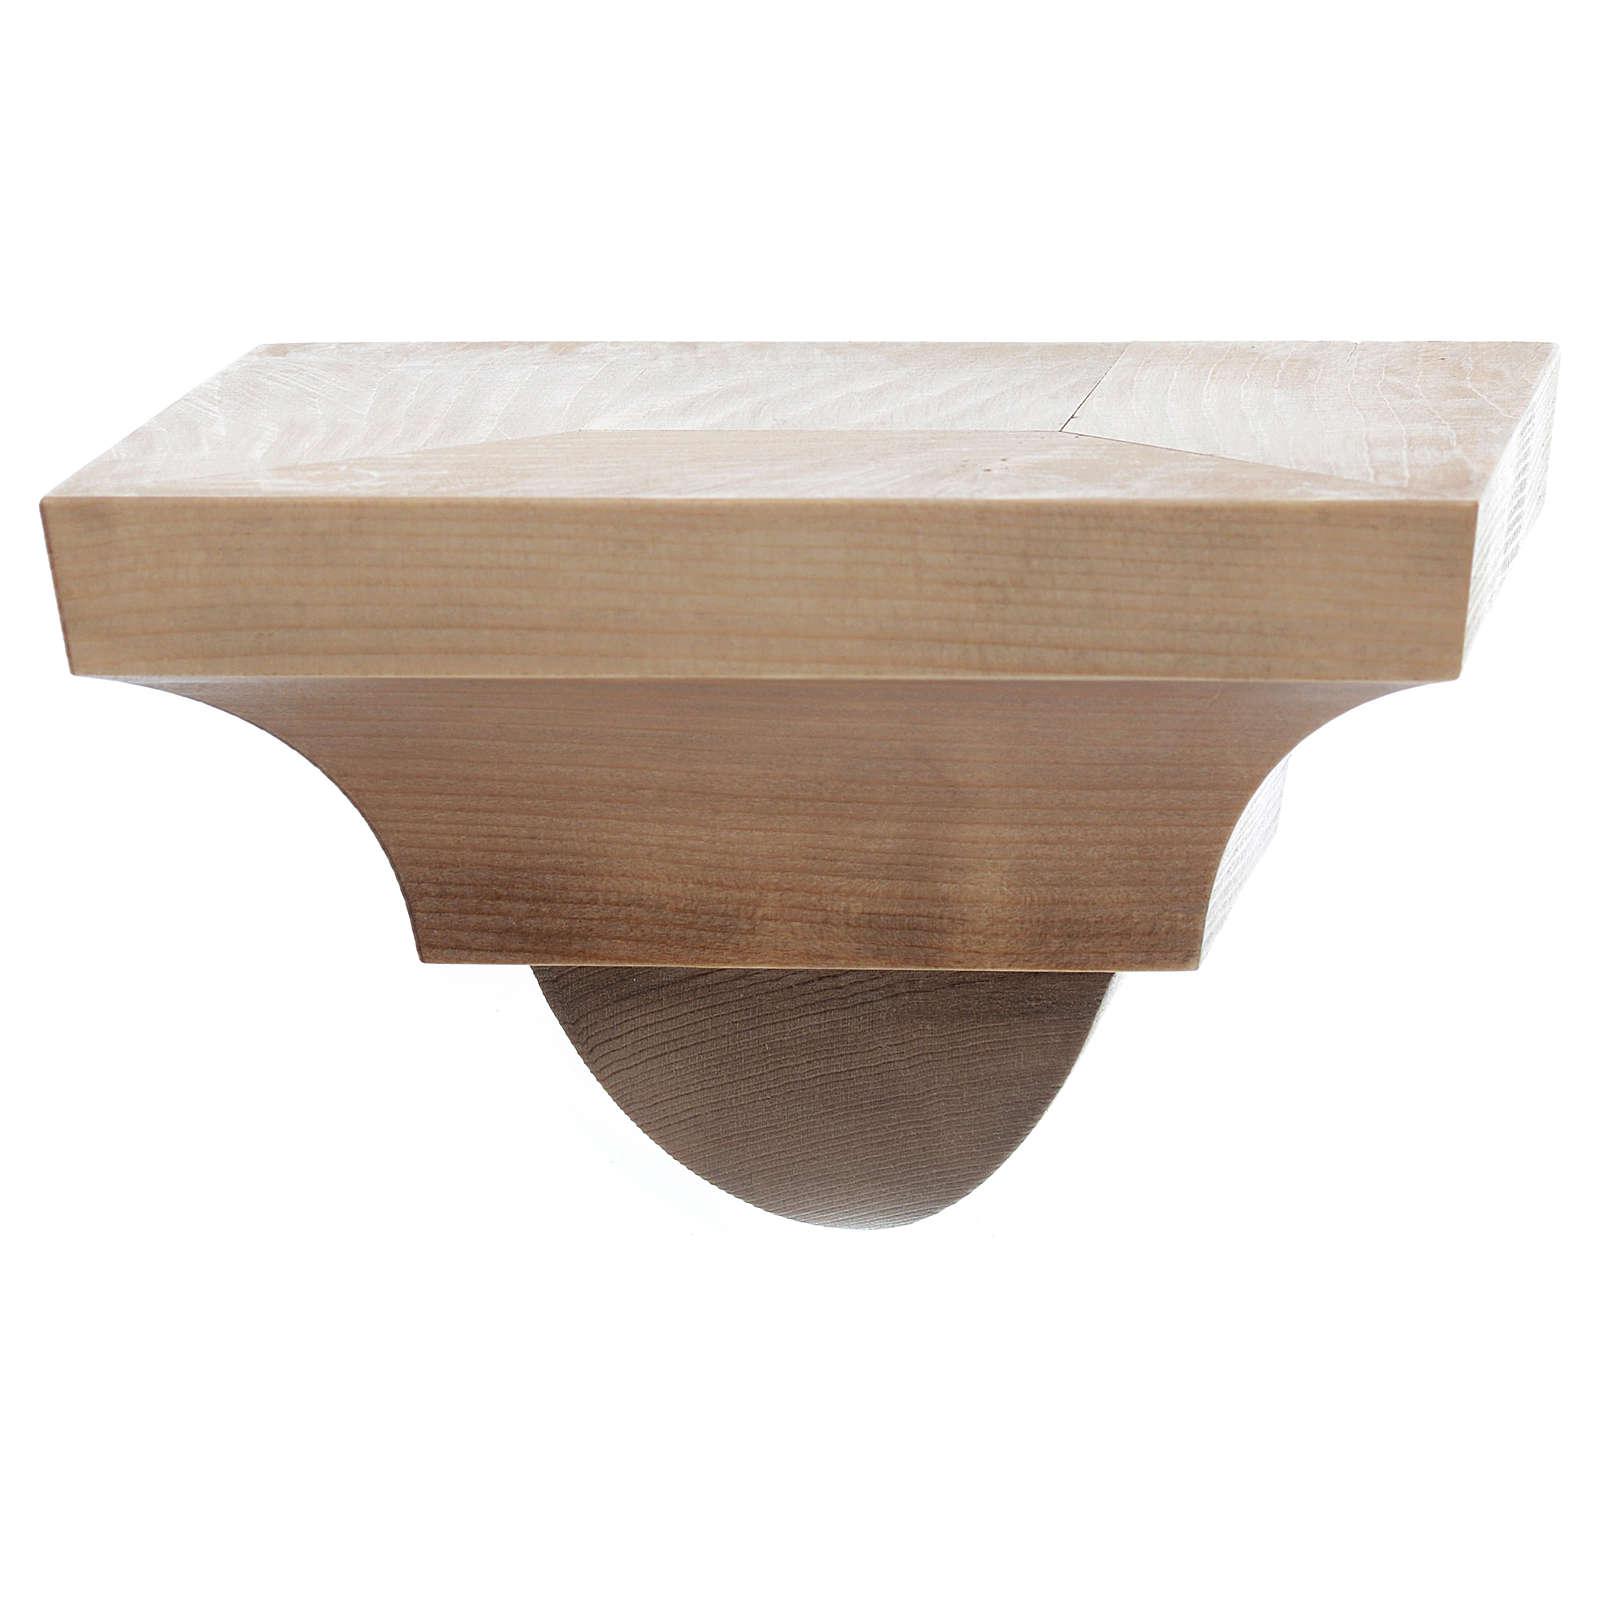 Ménsula pared para imágenes de madera 9x11cm varias patinaduras 4